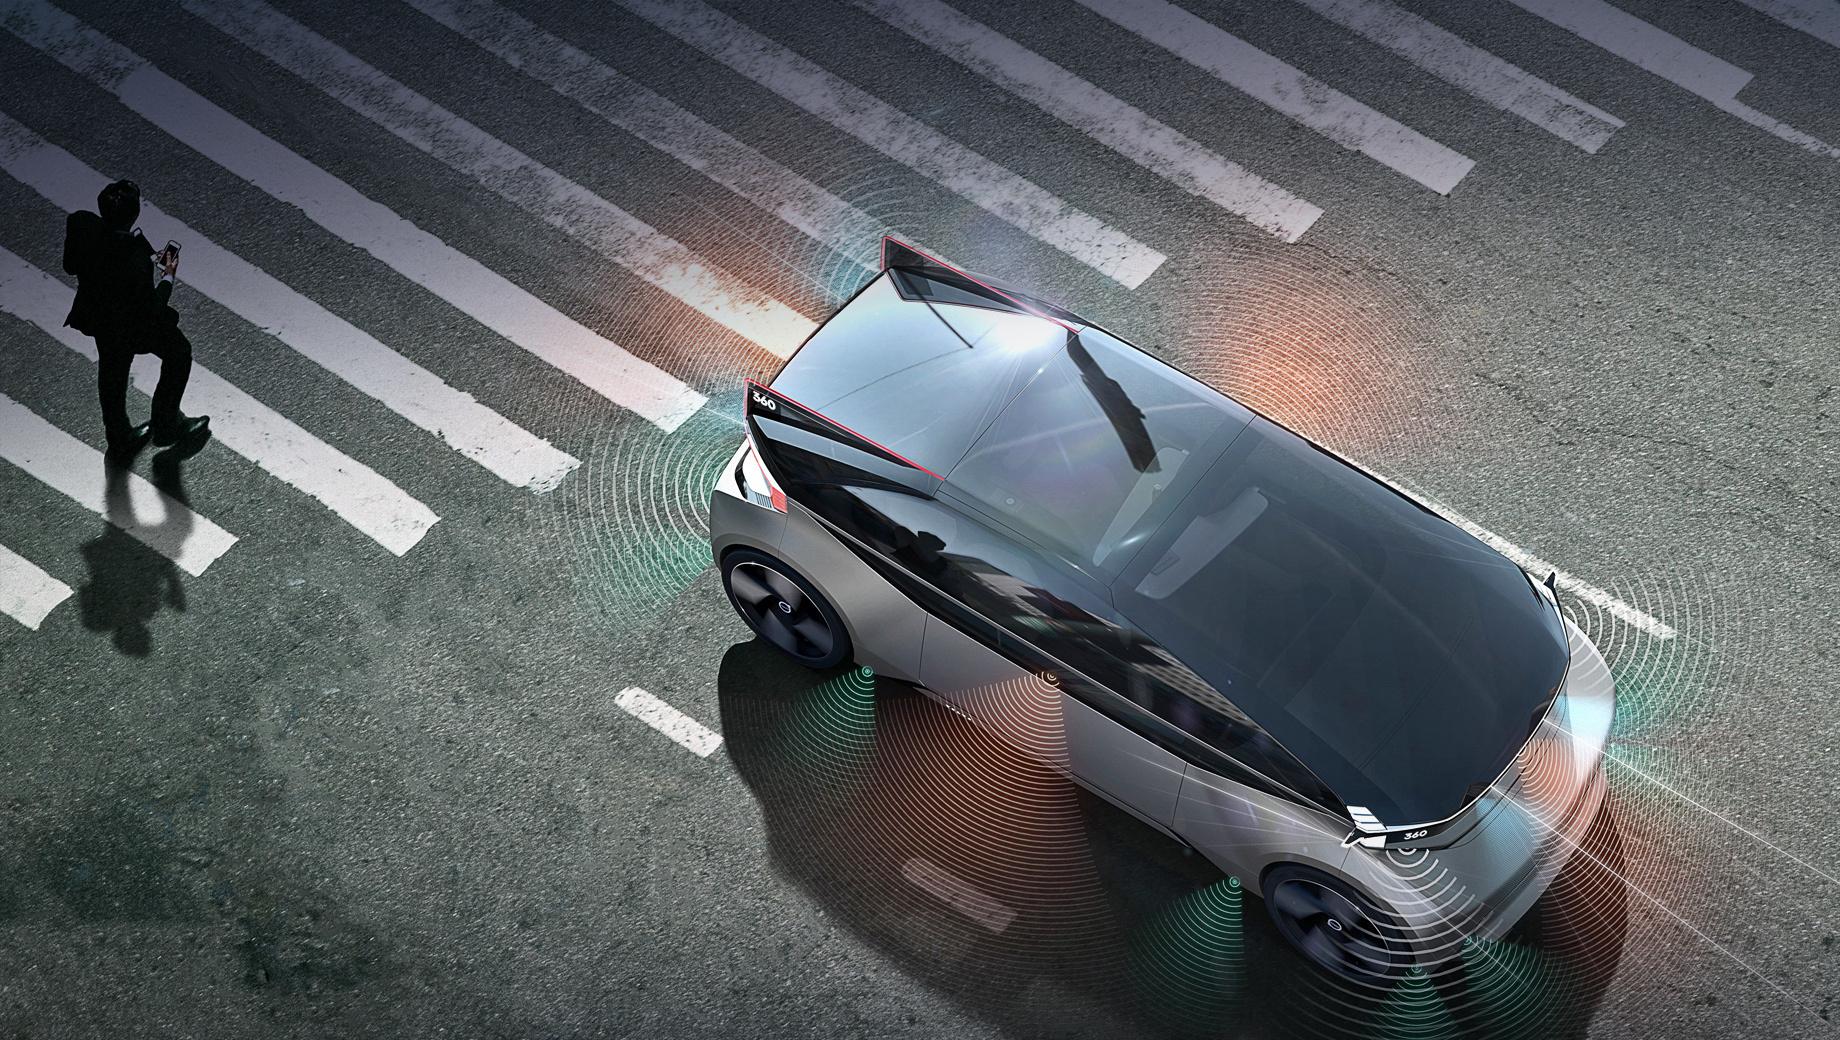 Автомобили Volvo установят связь 5G с инфраструктурой в Китае. thumbnail